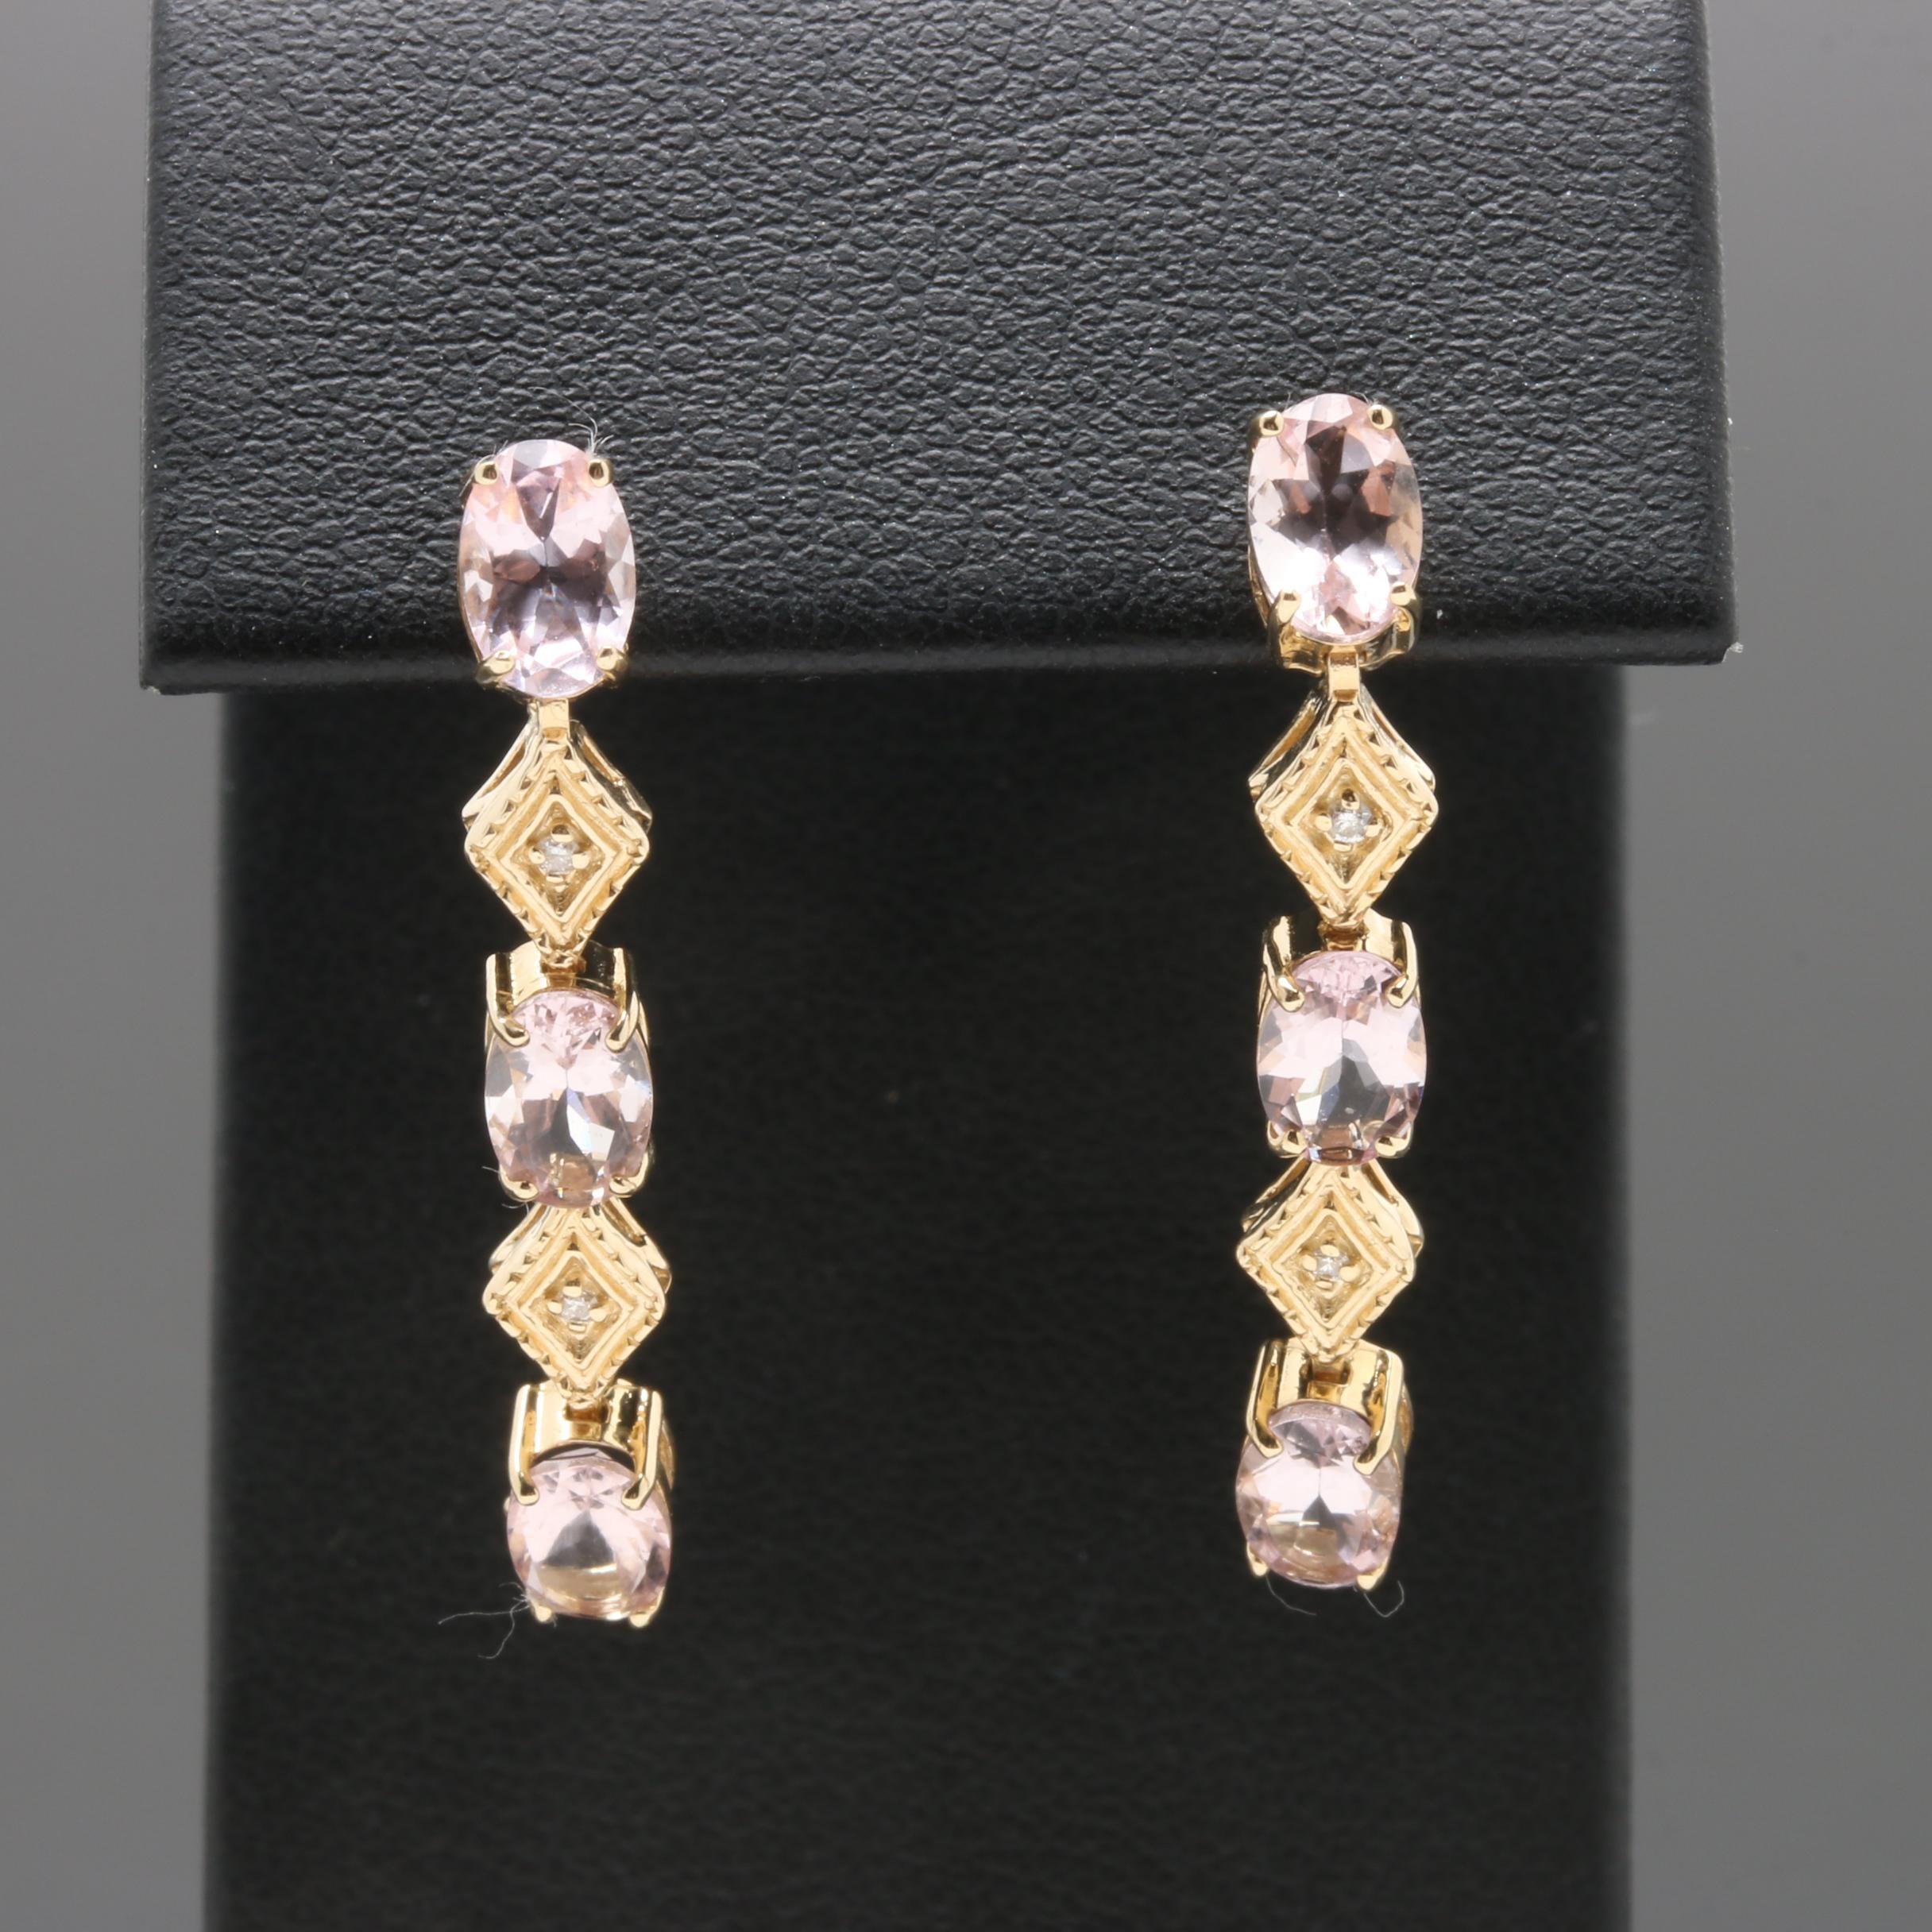 14K Yellow Gold Morganite and Diamond Earrings